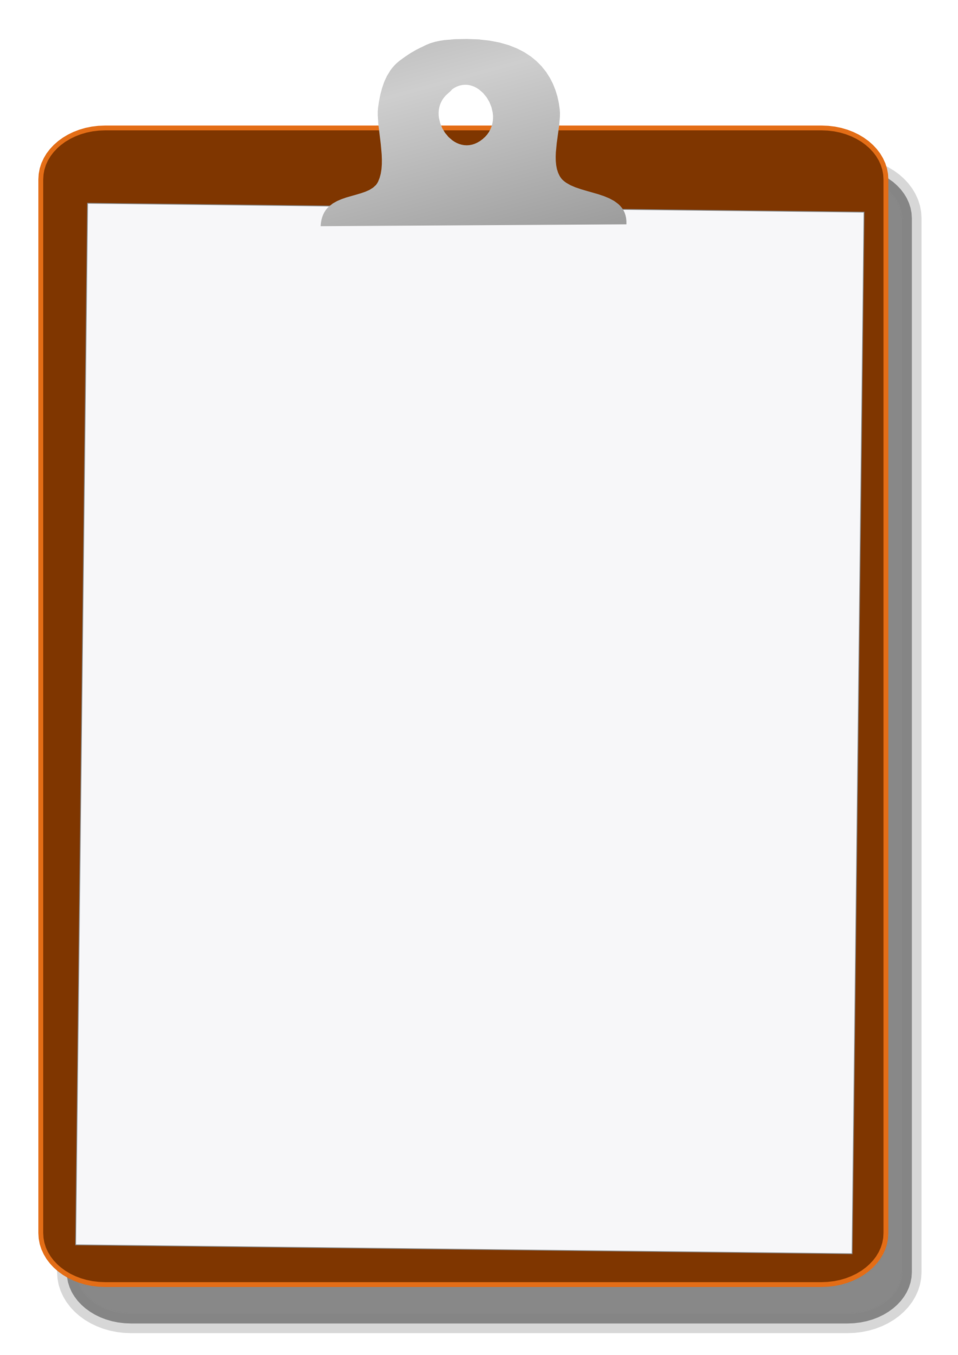 clipboard 01